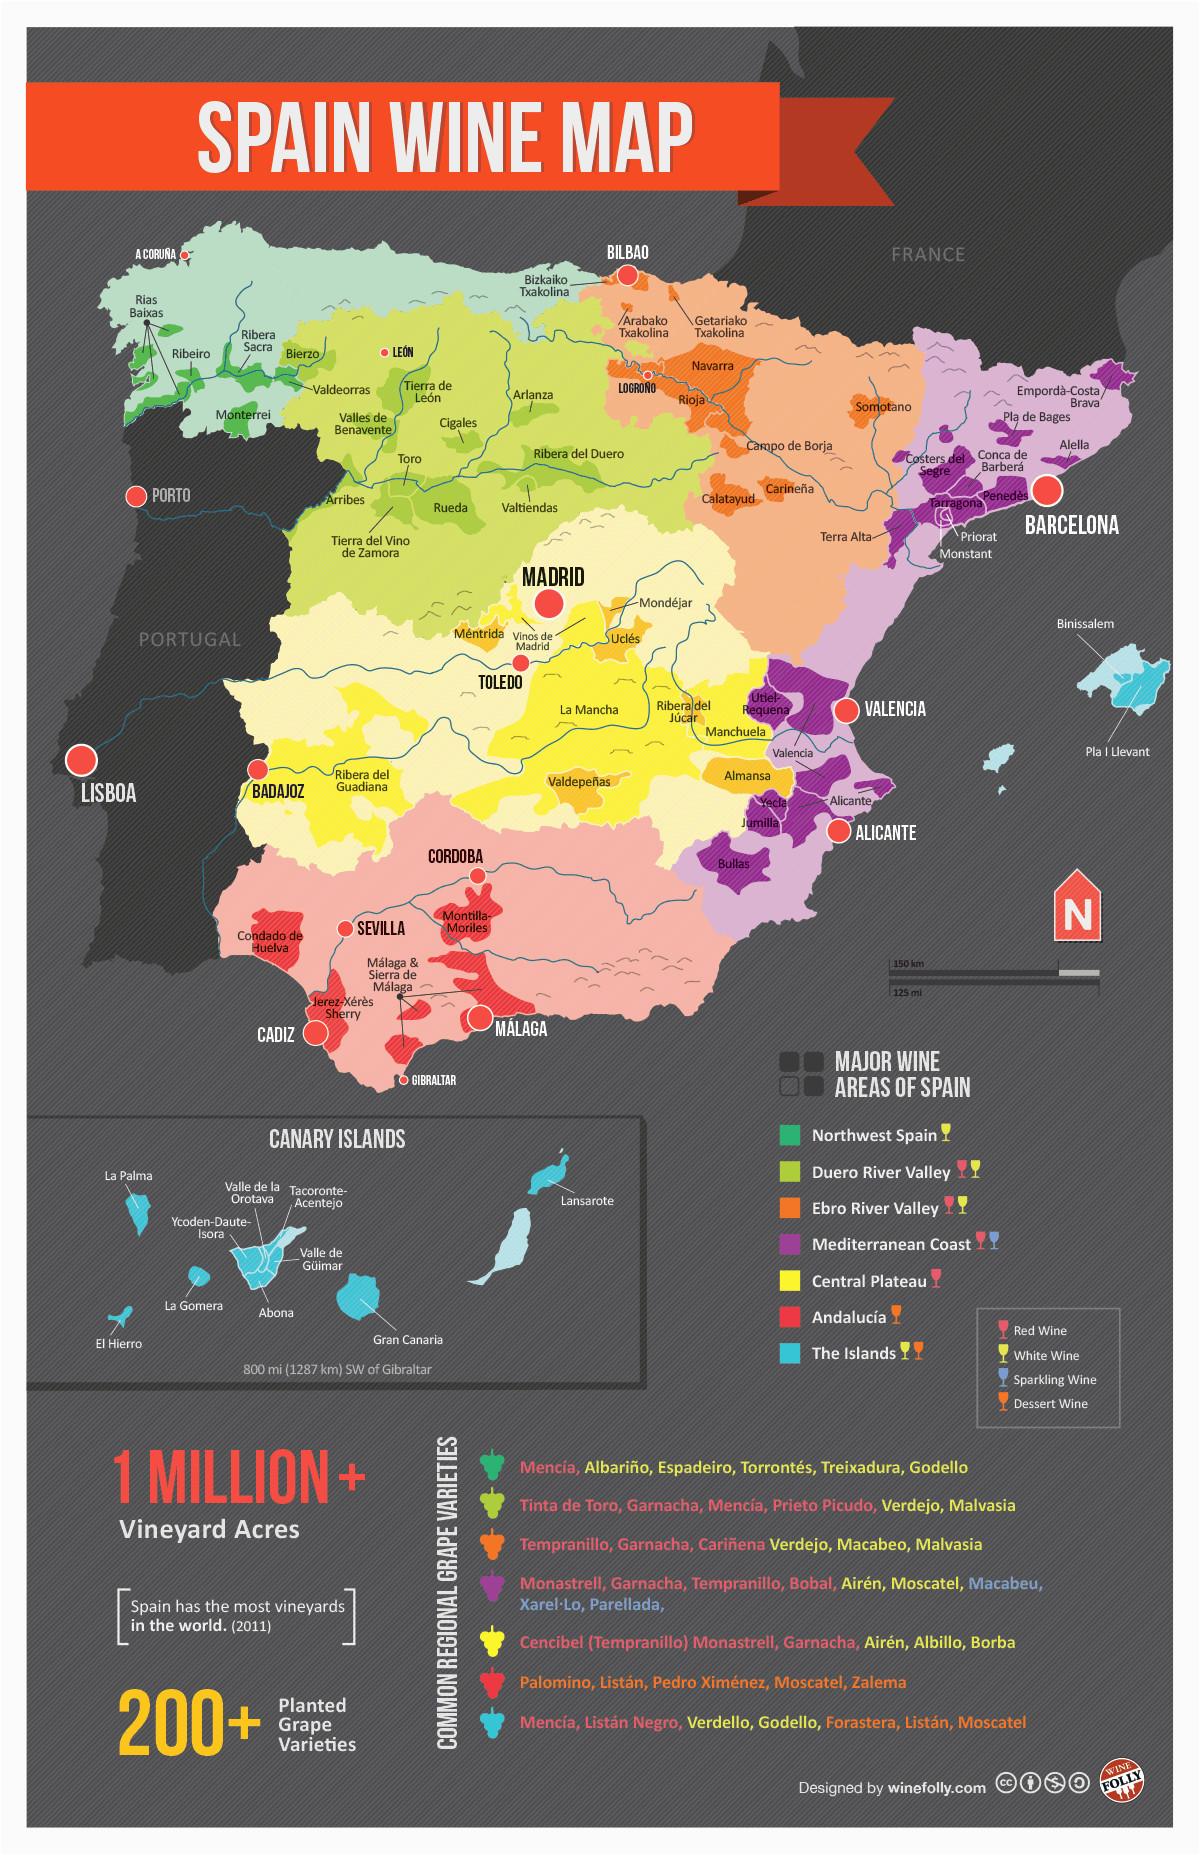 map of spanish wine regions via reddit wine in 2018 i i i i i i i